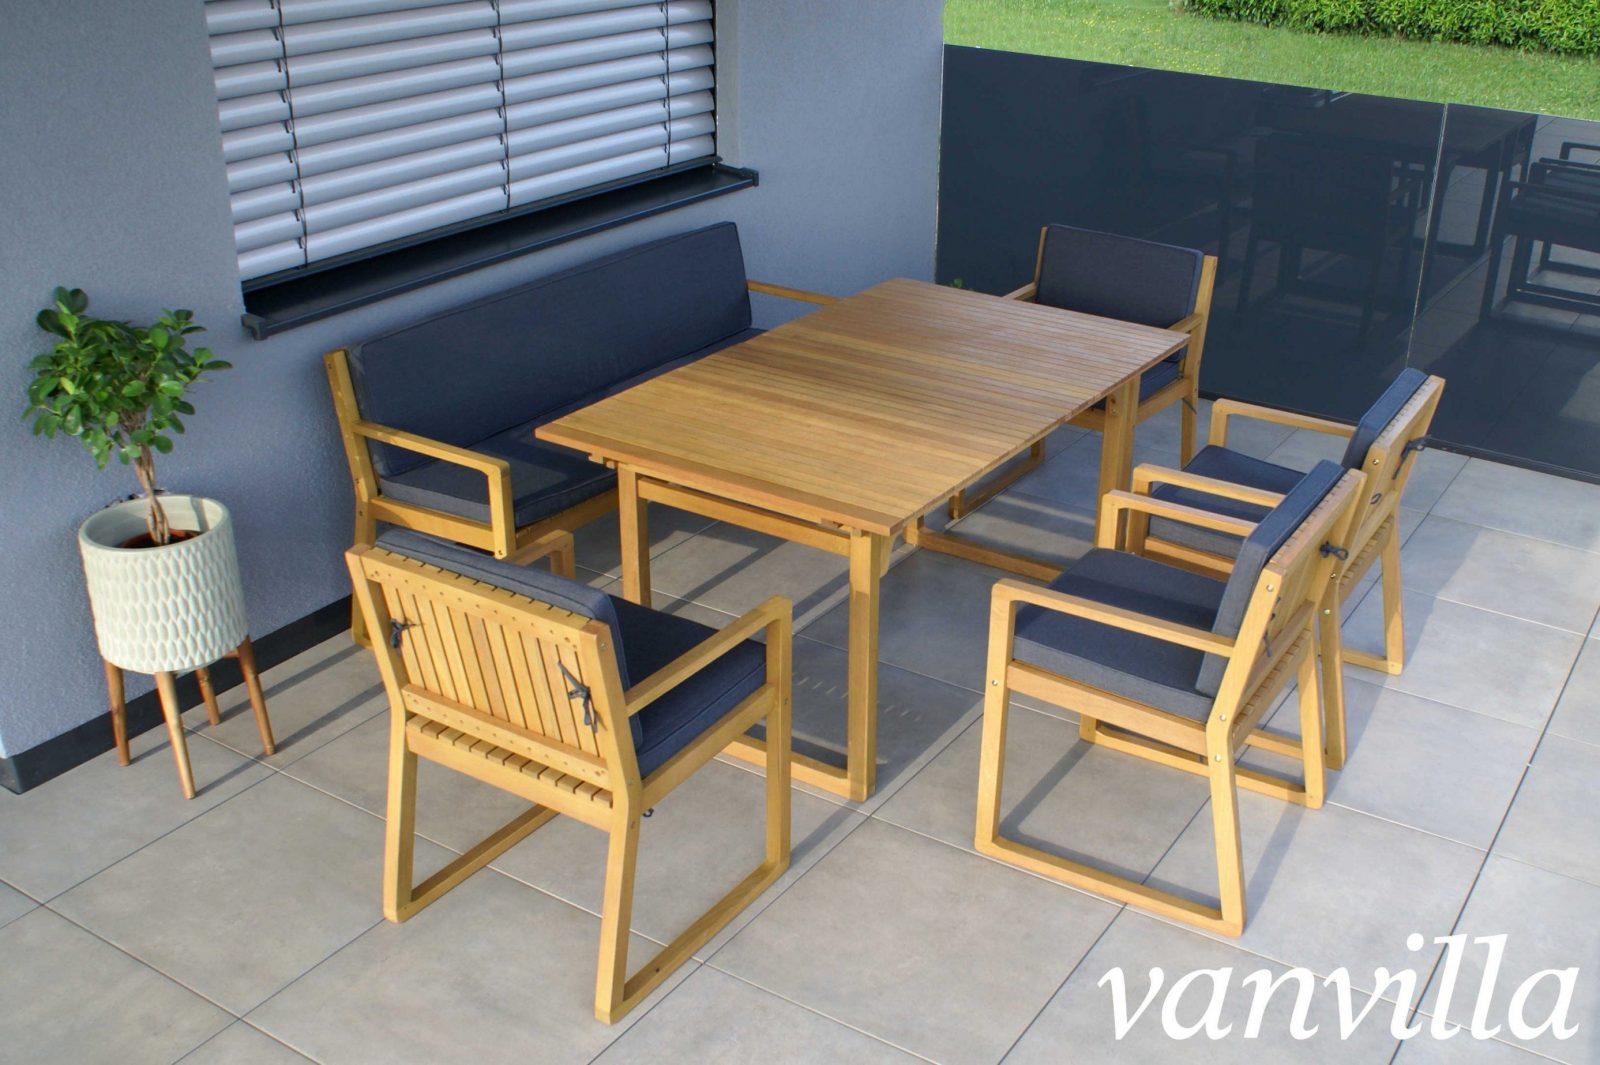 Vanvilla Gartenmöbel Set Holz 1 Tisch 1 Bank 4 Sessel Set1 Auflage Grau von Gartenmöbel Set Holz Mit Bank Photo